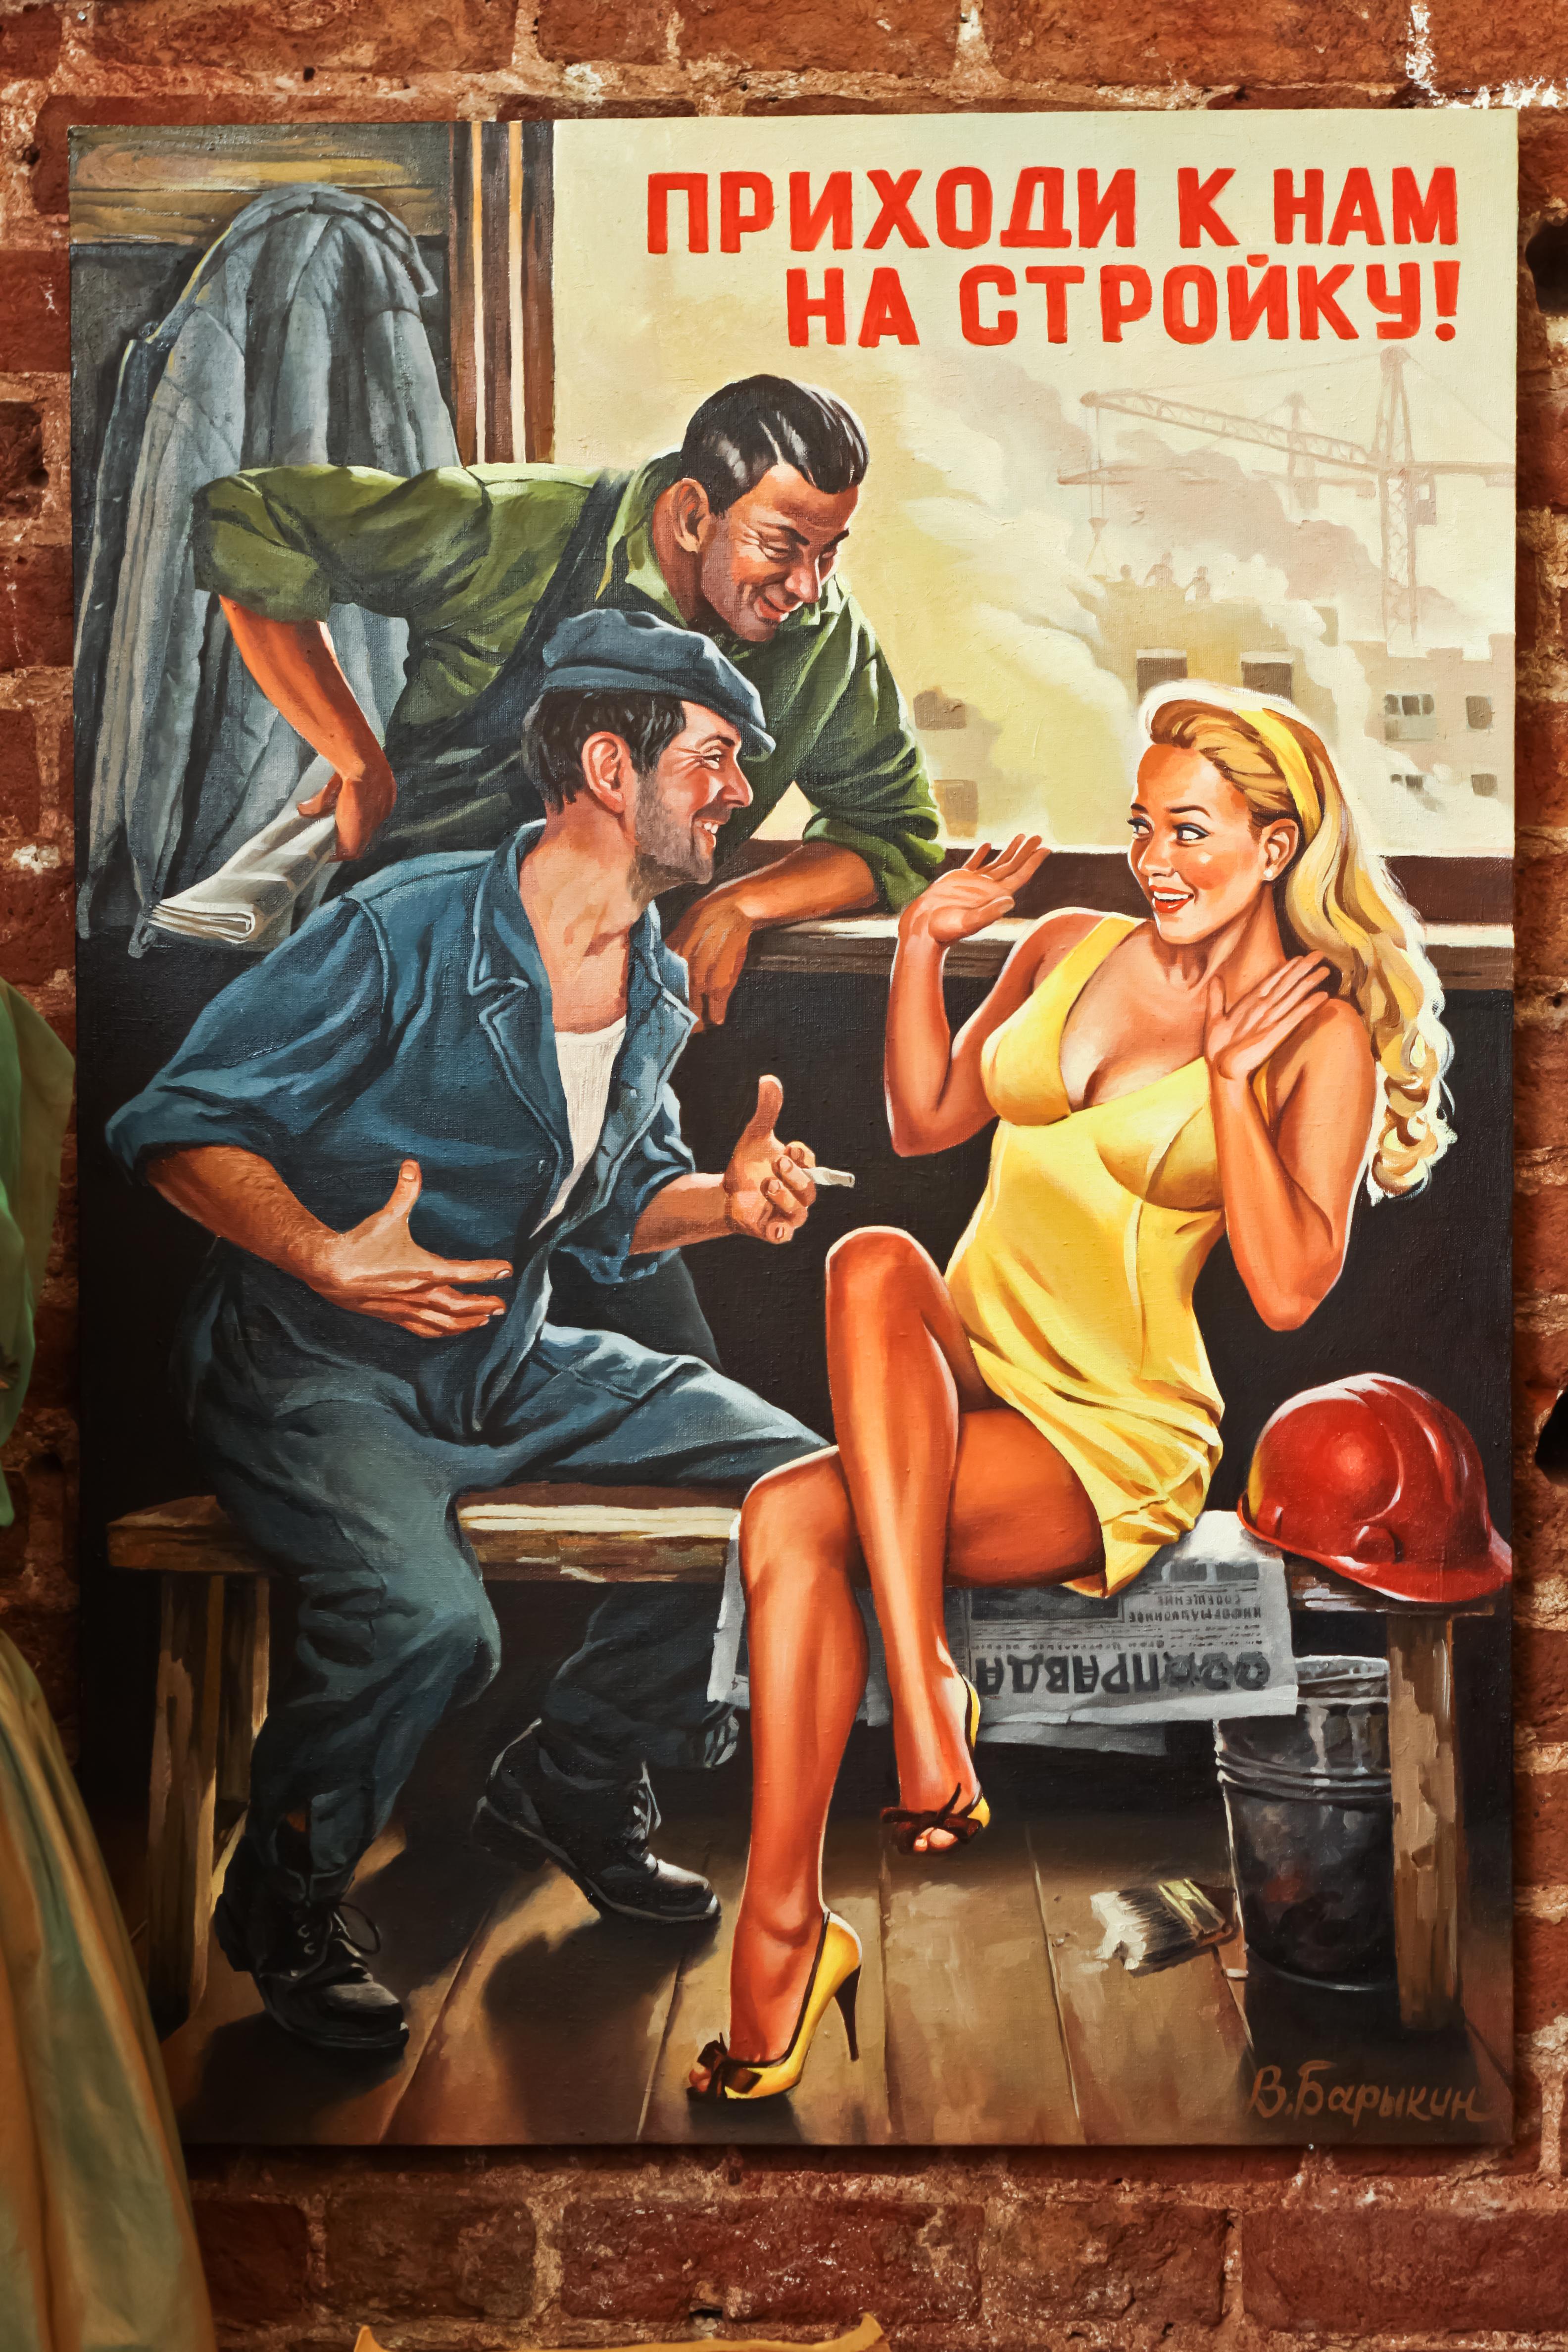 Секс с строителями 14 фотография